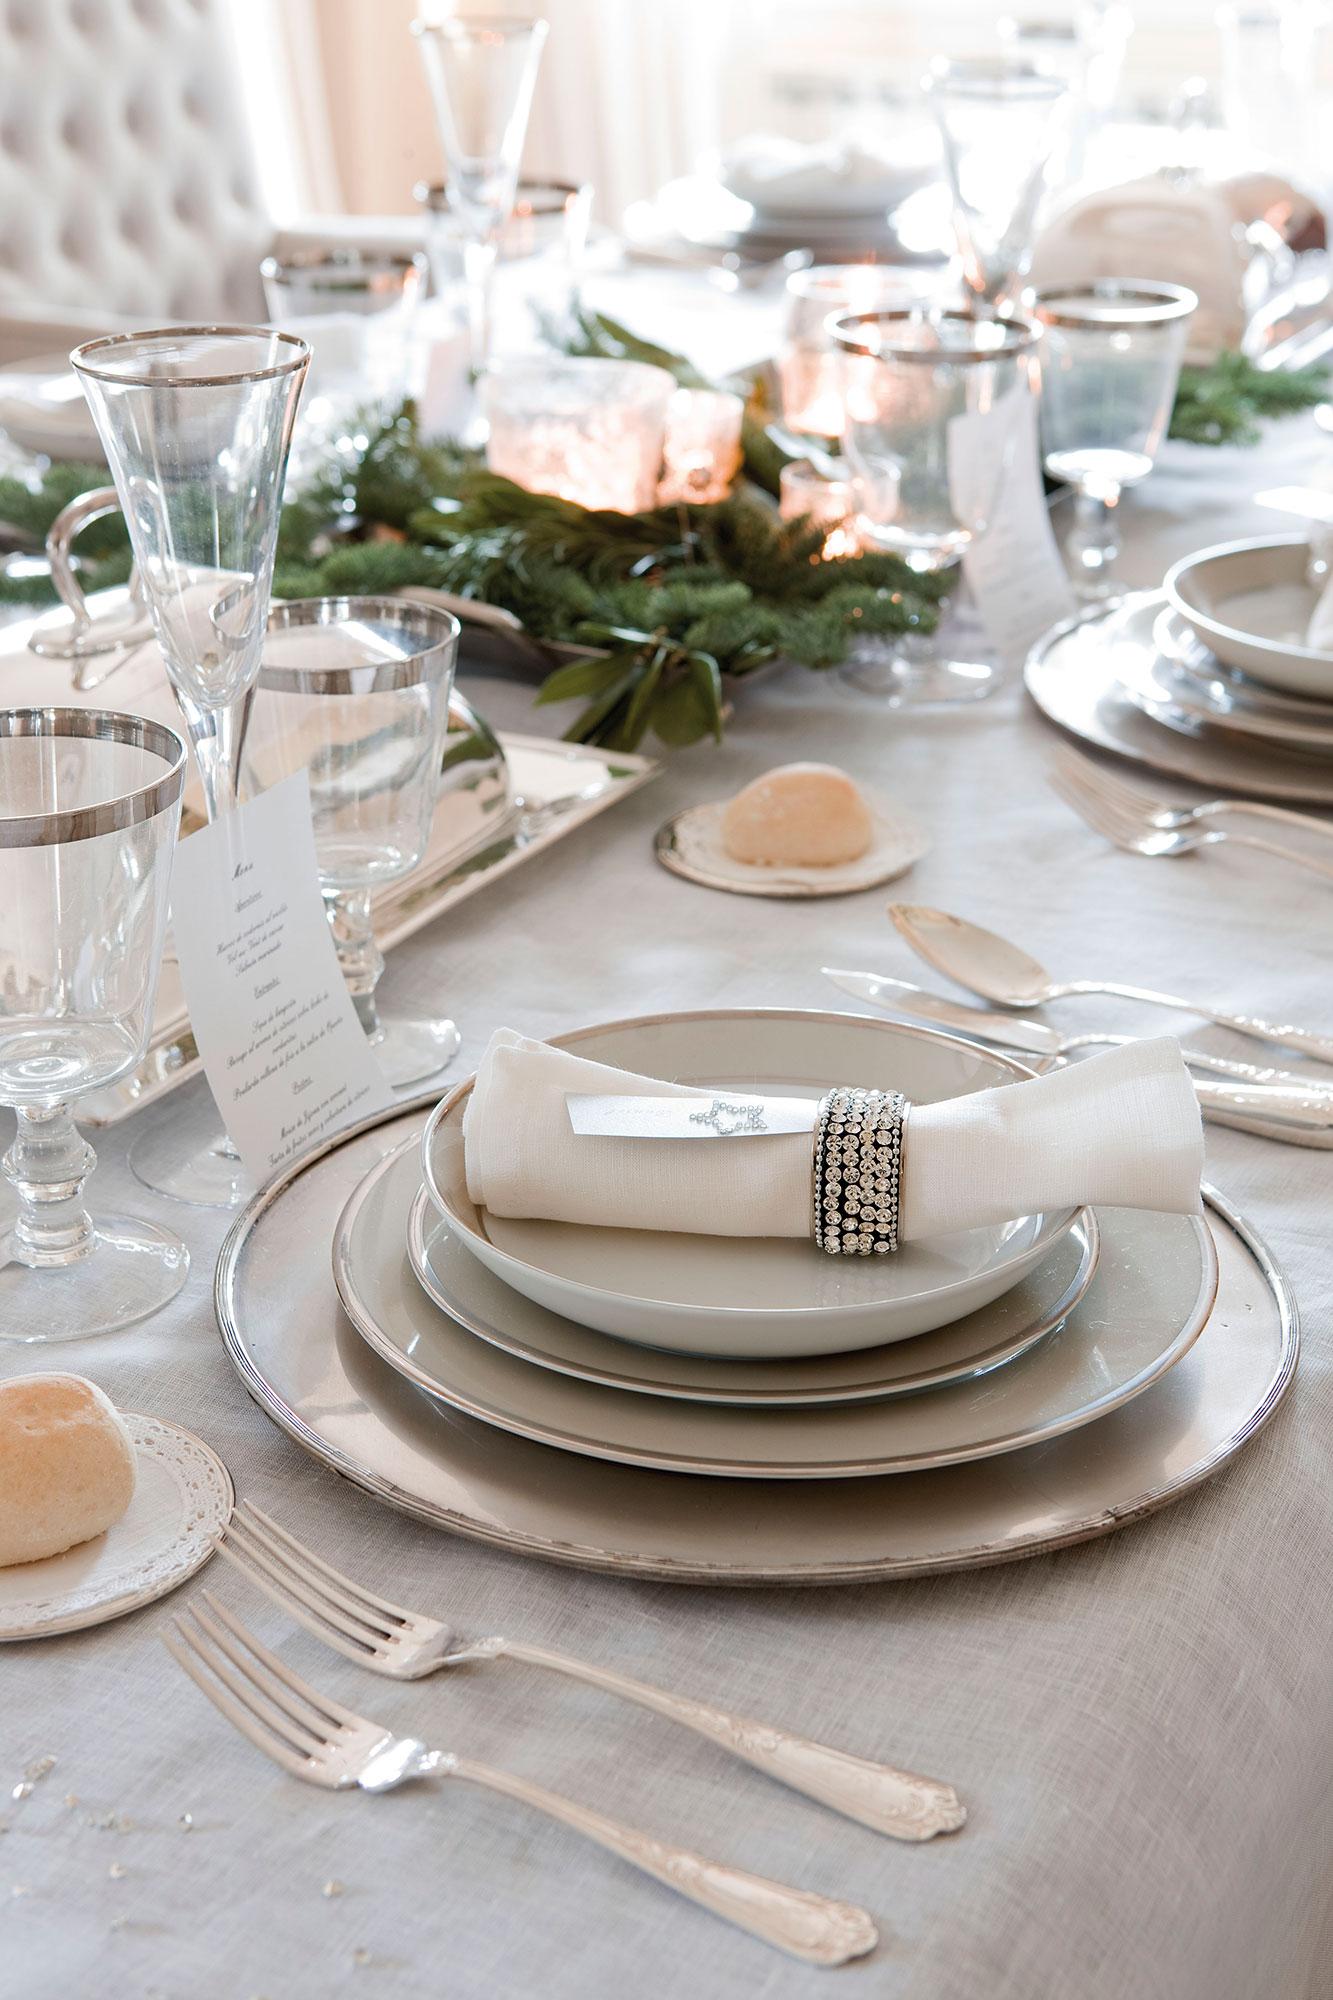 Detalles e ideas en plata para decorar tu casa esta navidad for Mesas decoradas para navidad